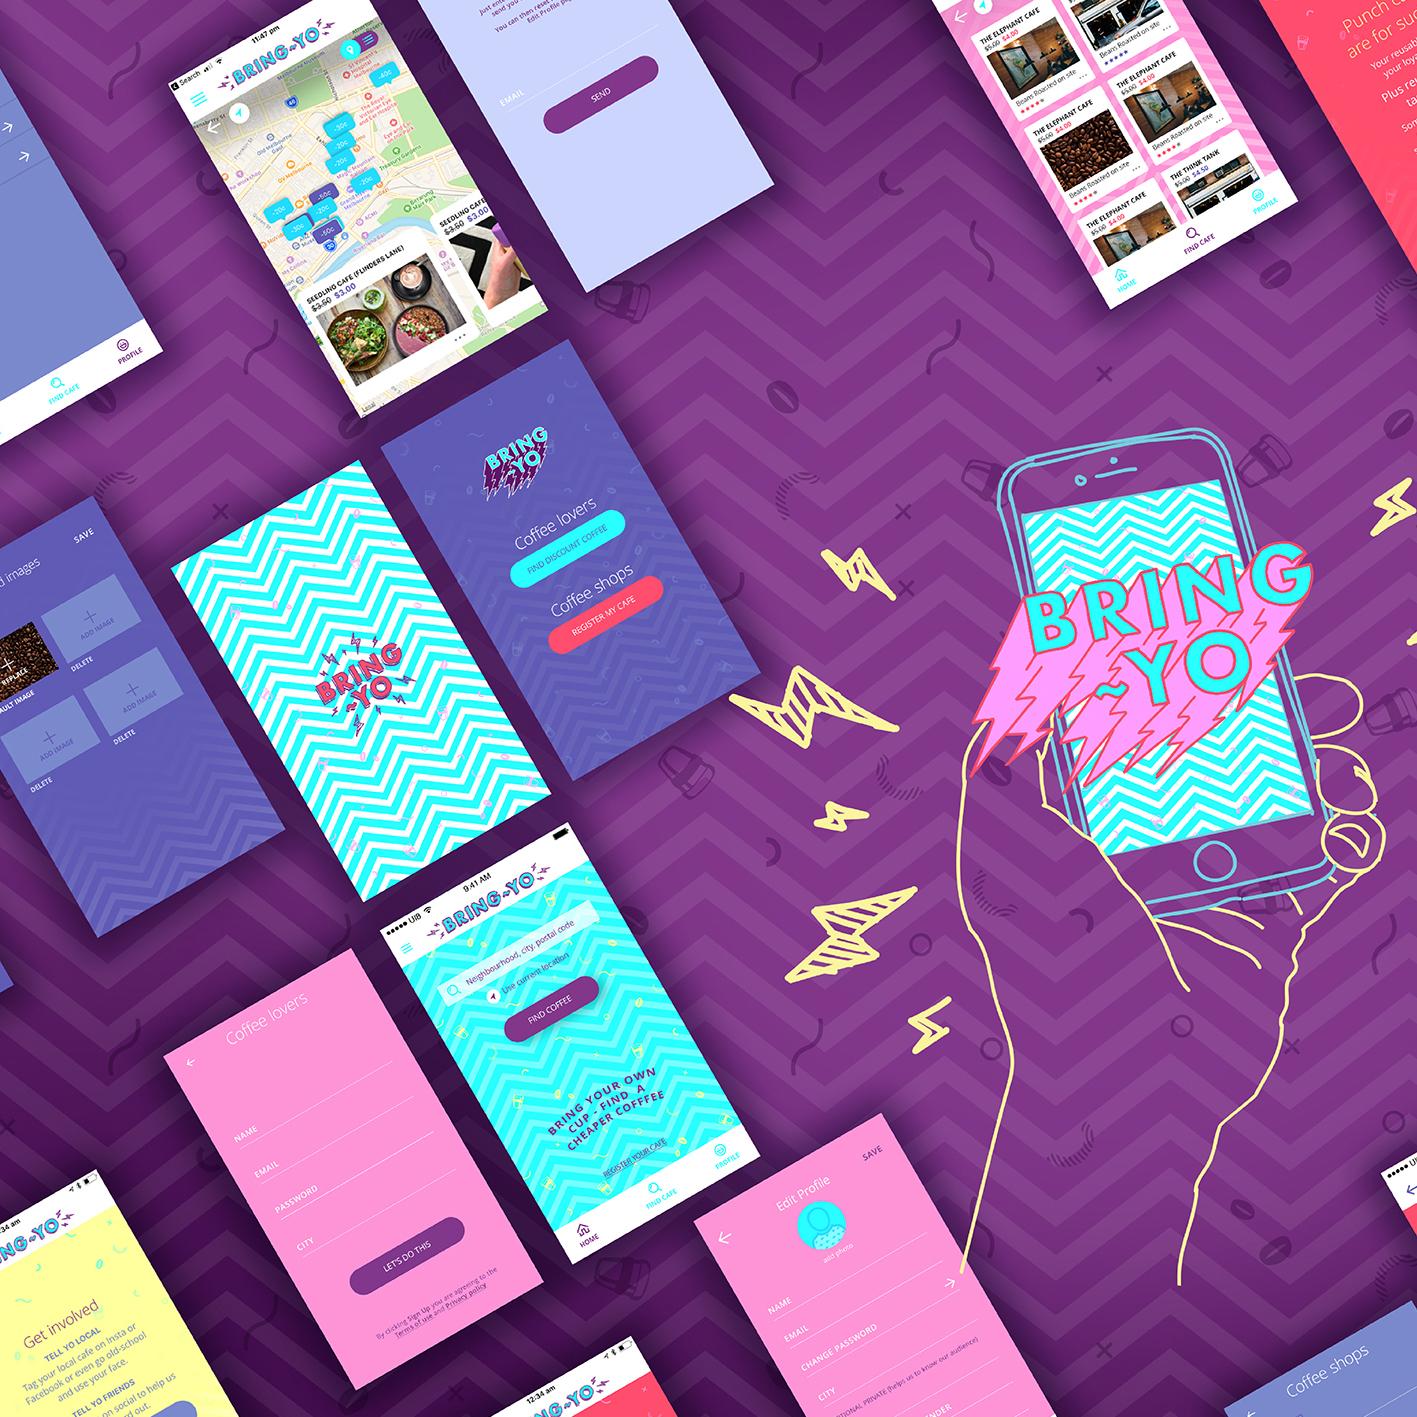 chris-winterton-bring-yo-app-ui-branding-design-handdrawn.jpg